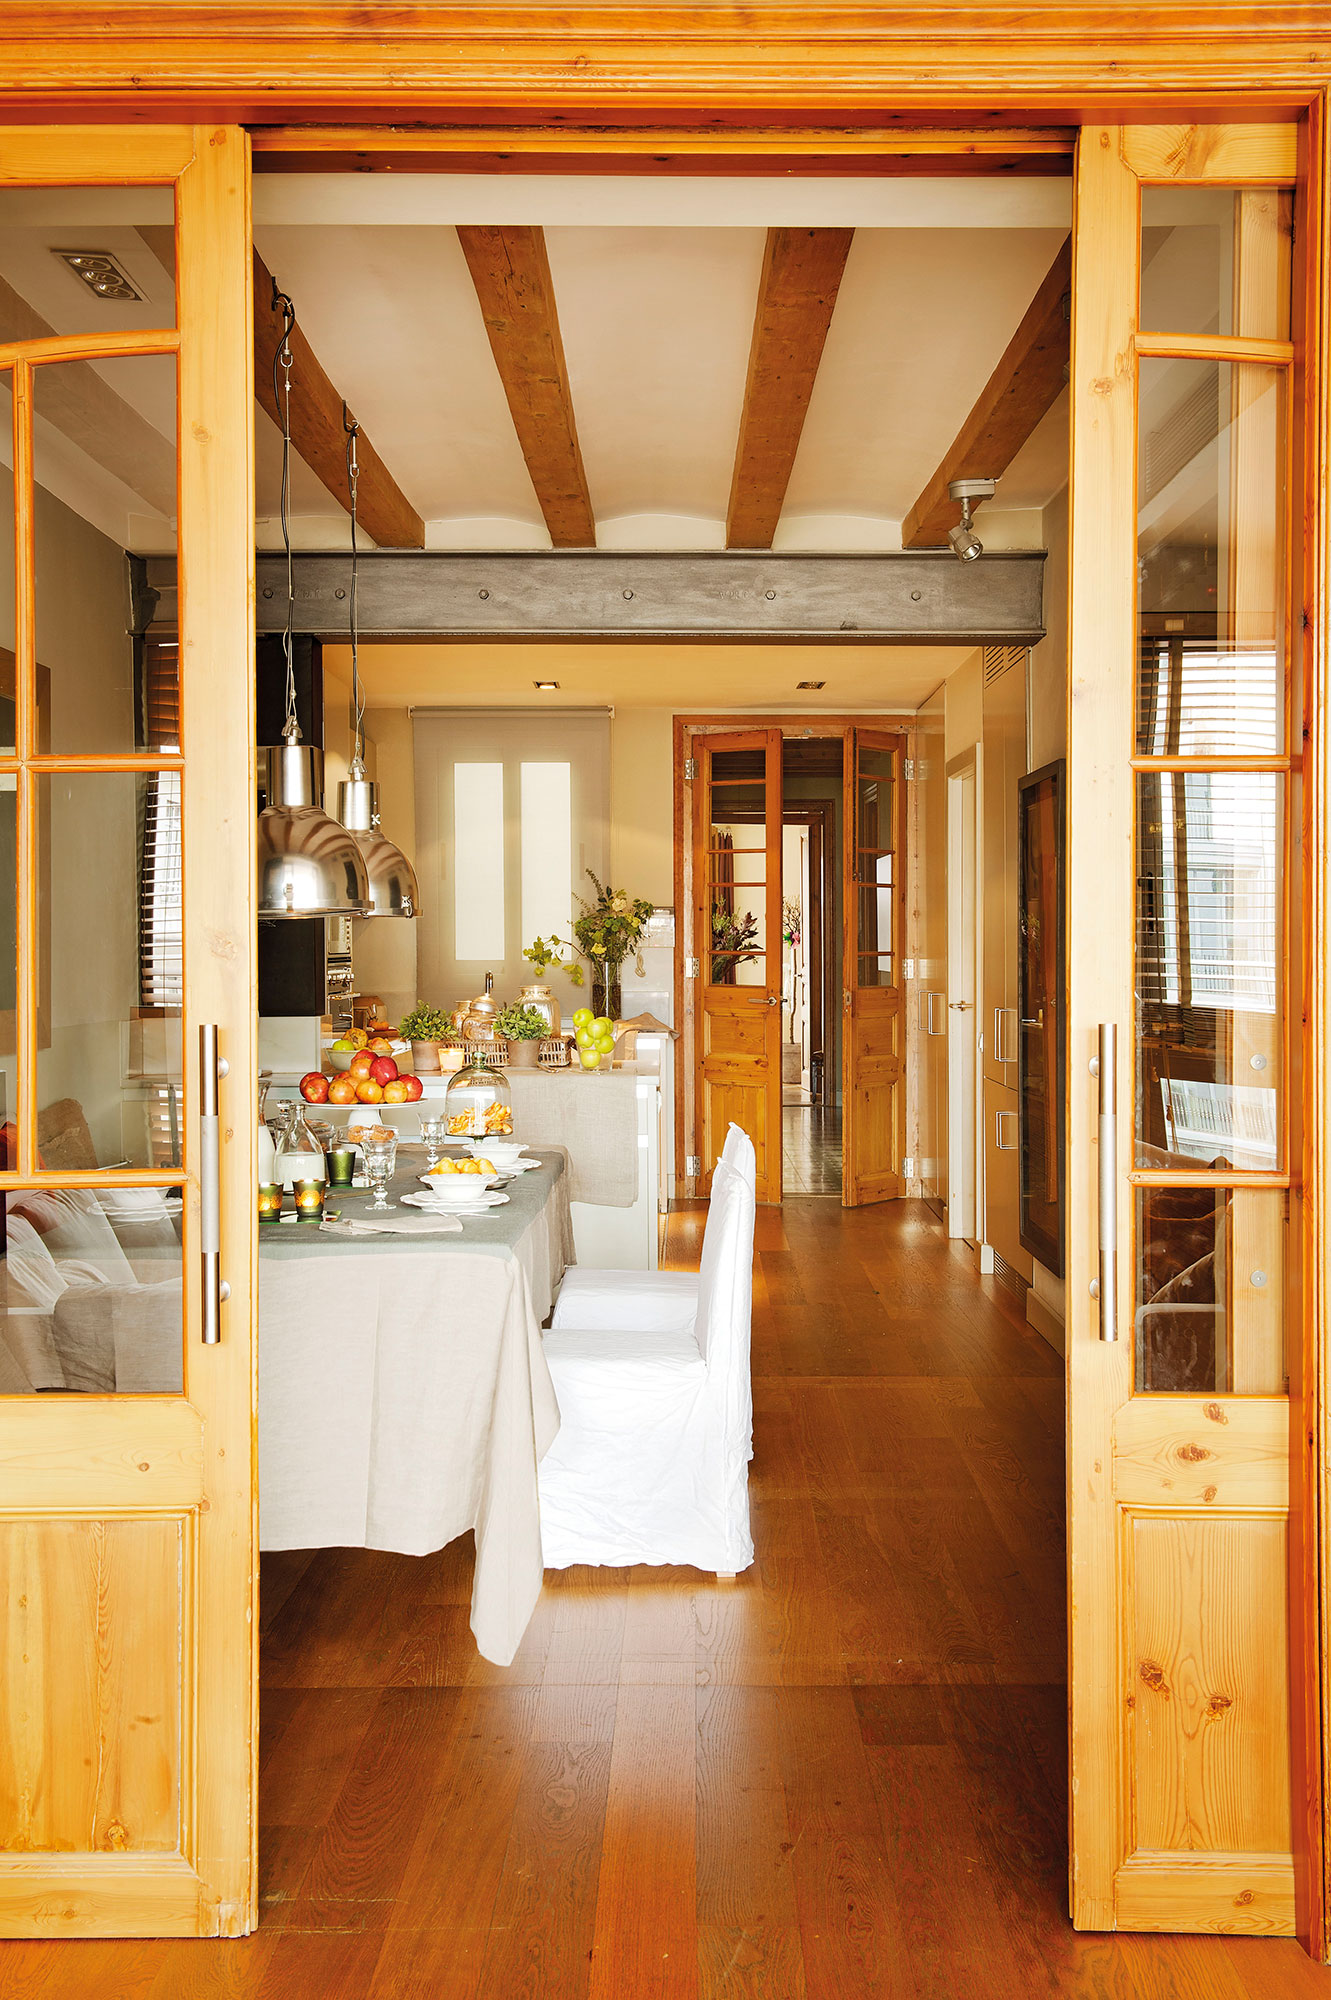 C mo renovar las puertas de casa for Modelos de puerta de madera para casa